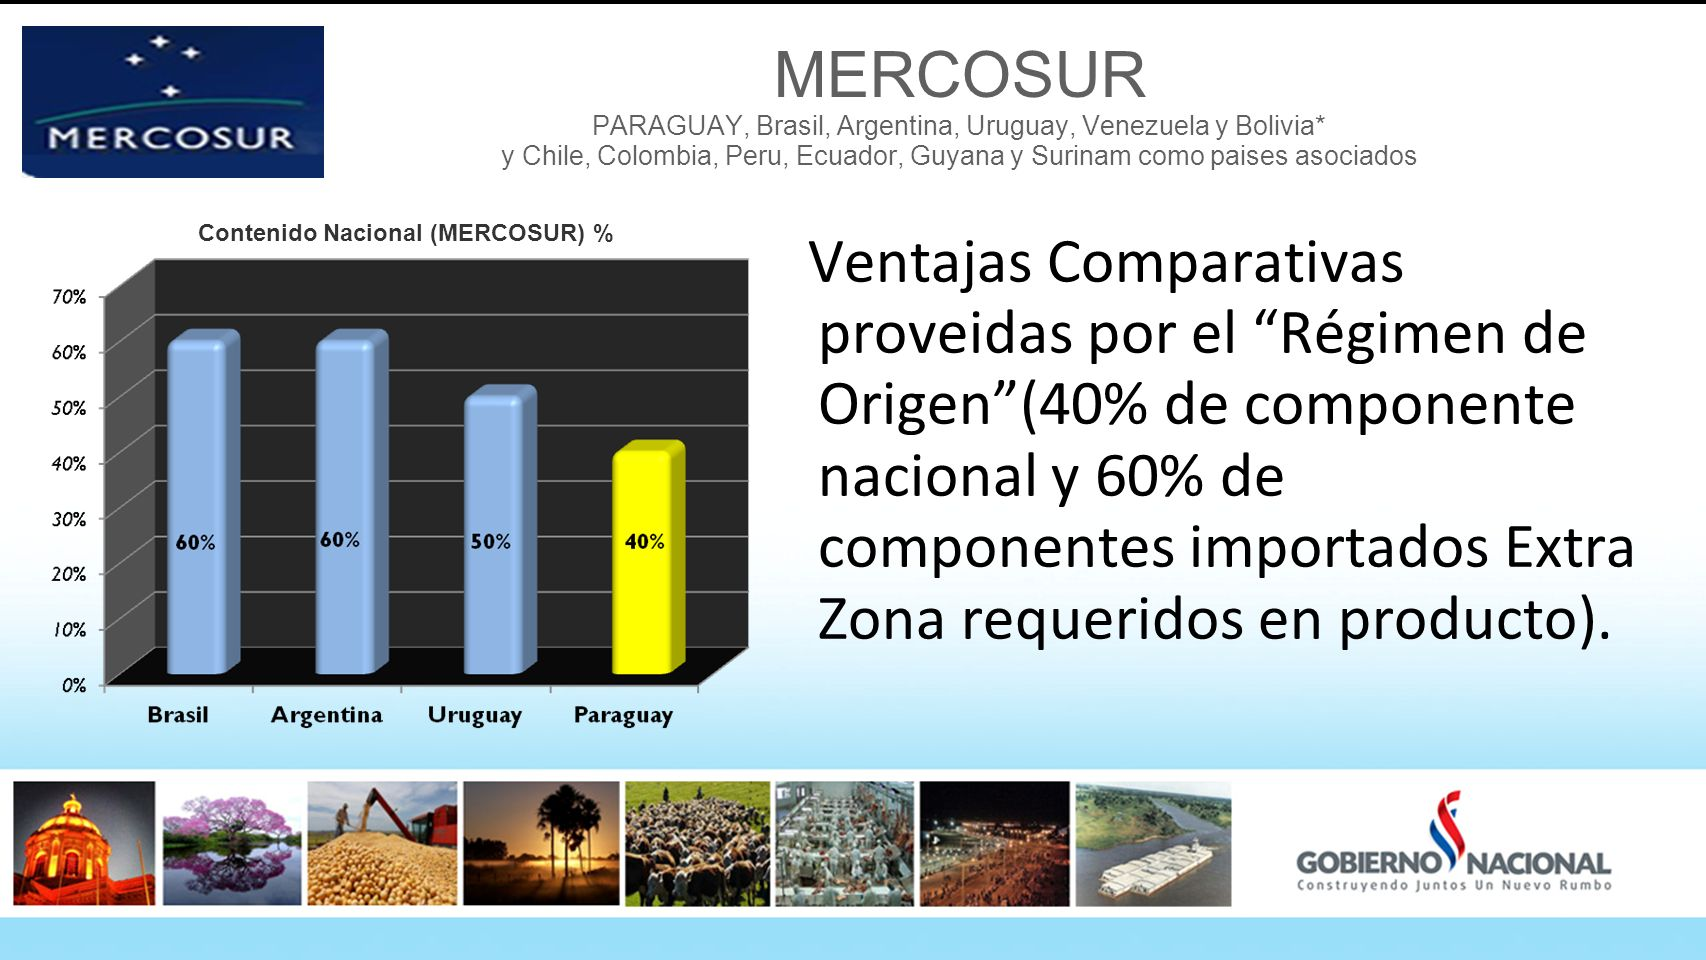 MERCOSUR PARAGUAY, Brasil, Argentina, Uruguay, Venezuela y Bolivia